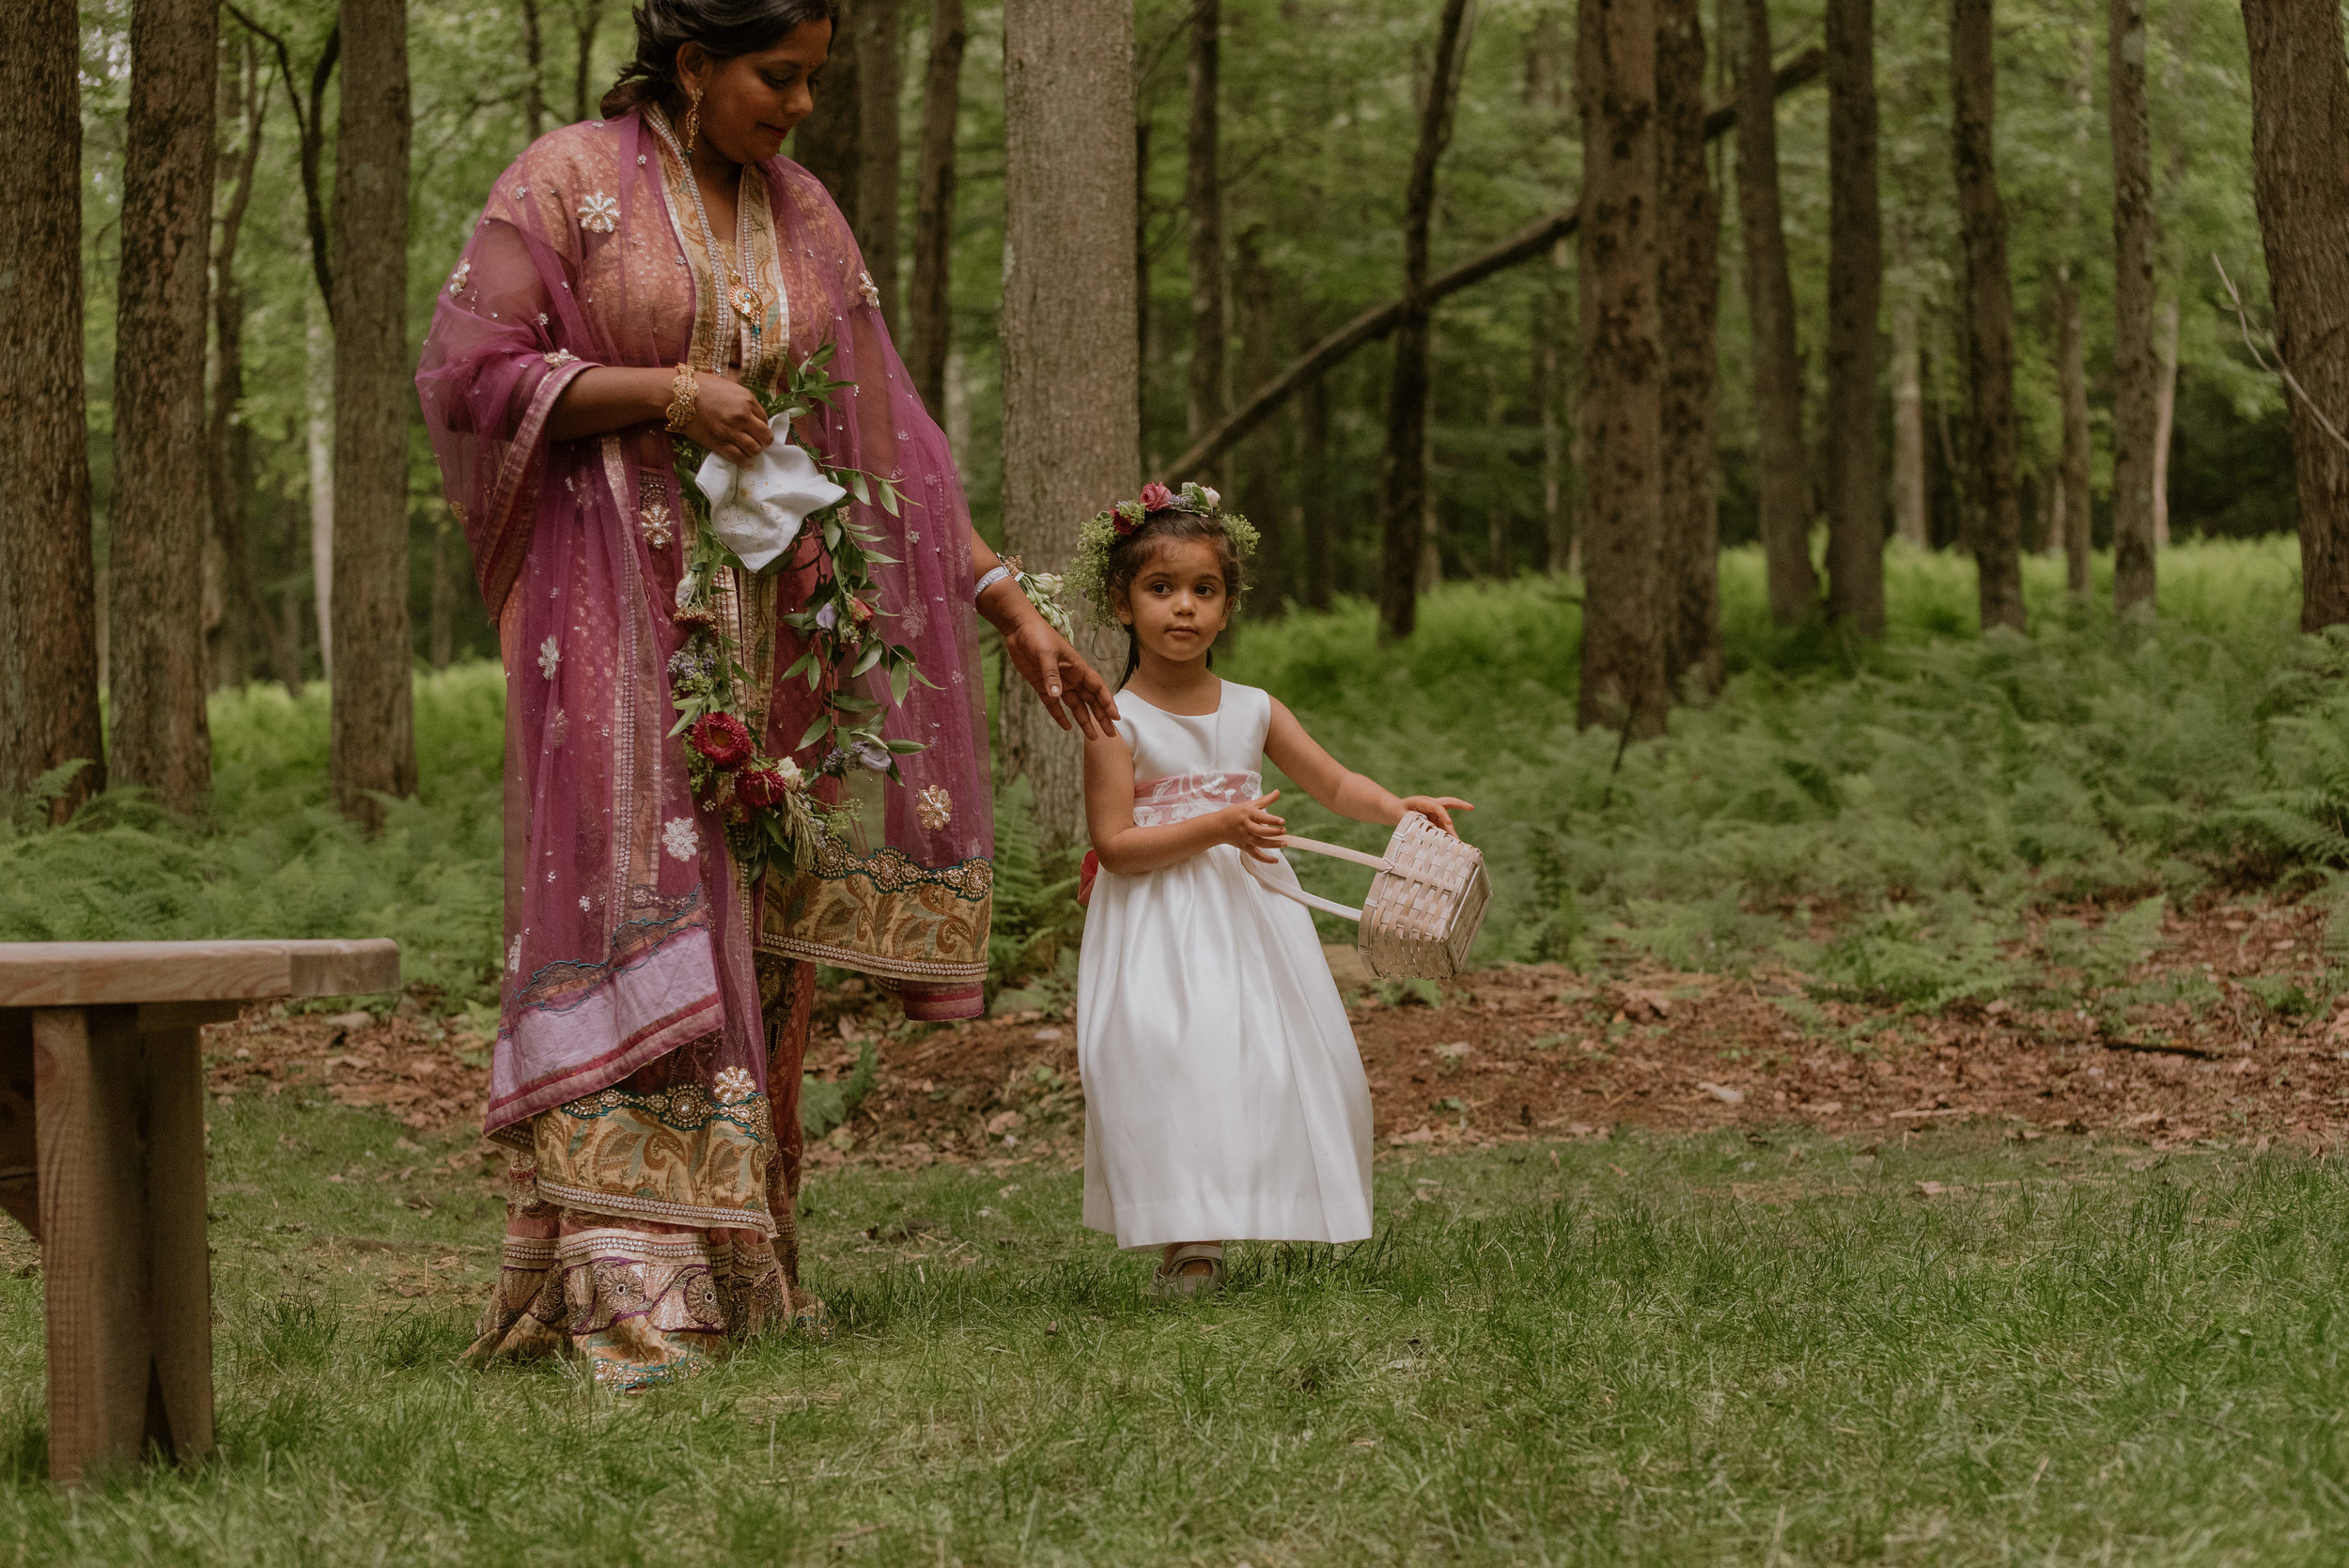 Cassandra-Anu-Wedding-Upstate-Catskills-Summer-Meadowlark-Stills-Lawrence-Braun-FINAL-0383.jpg